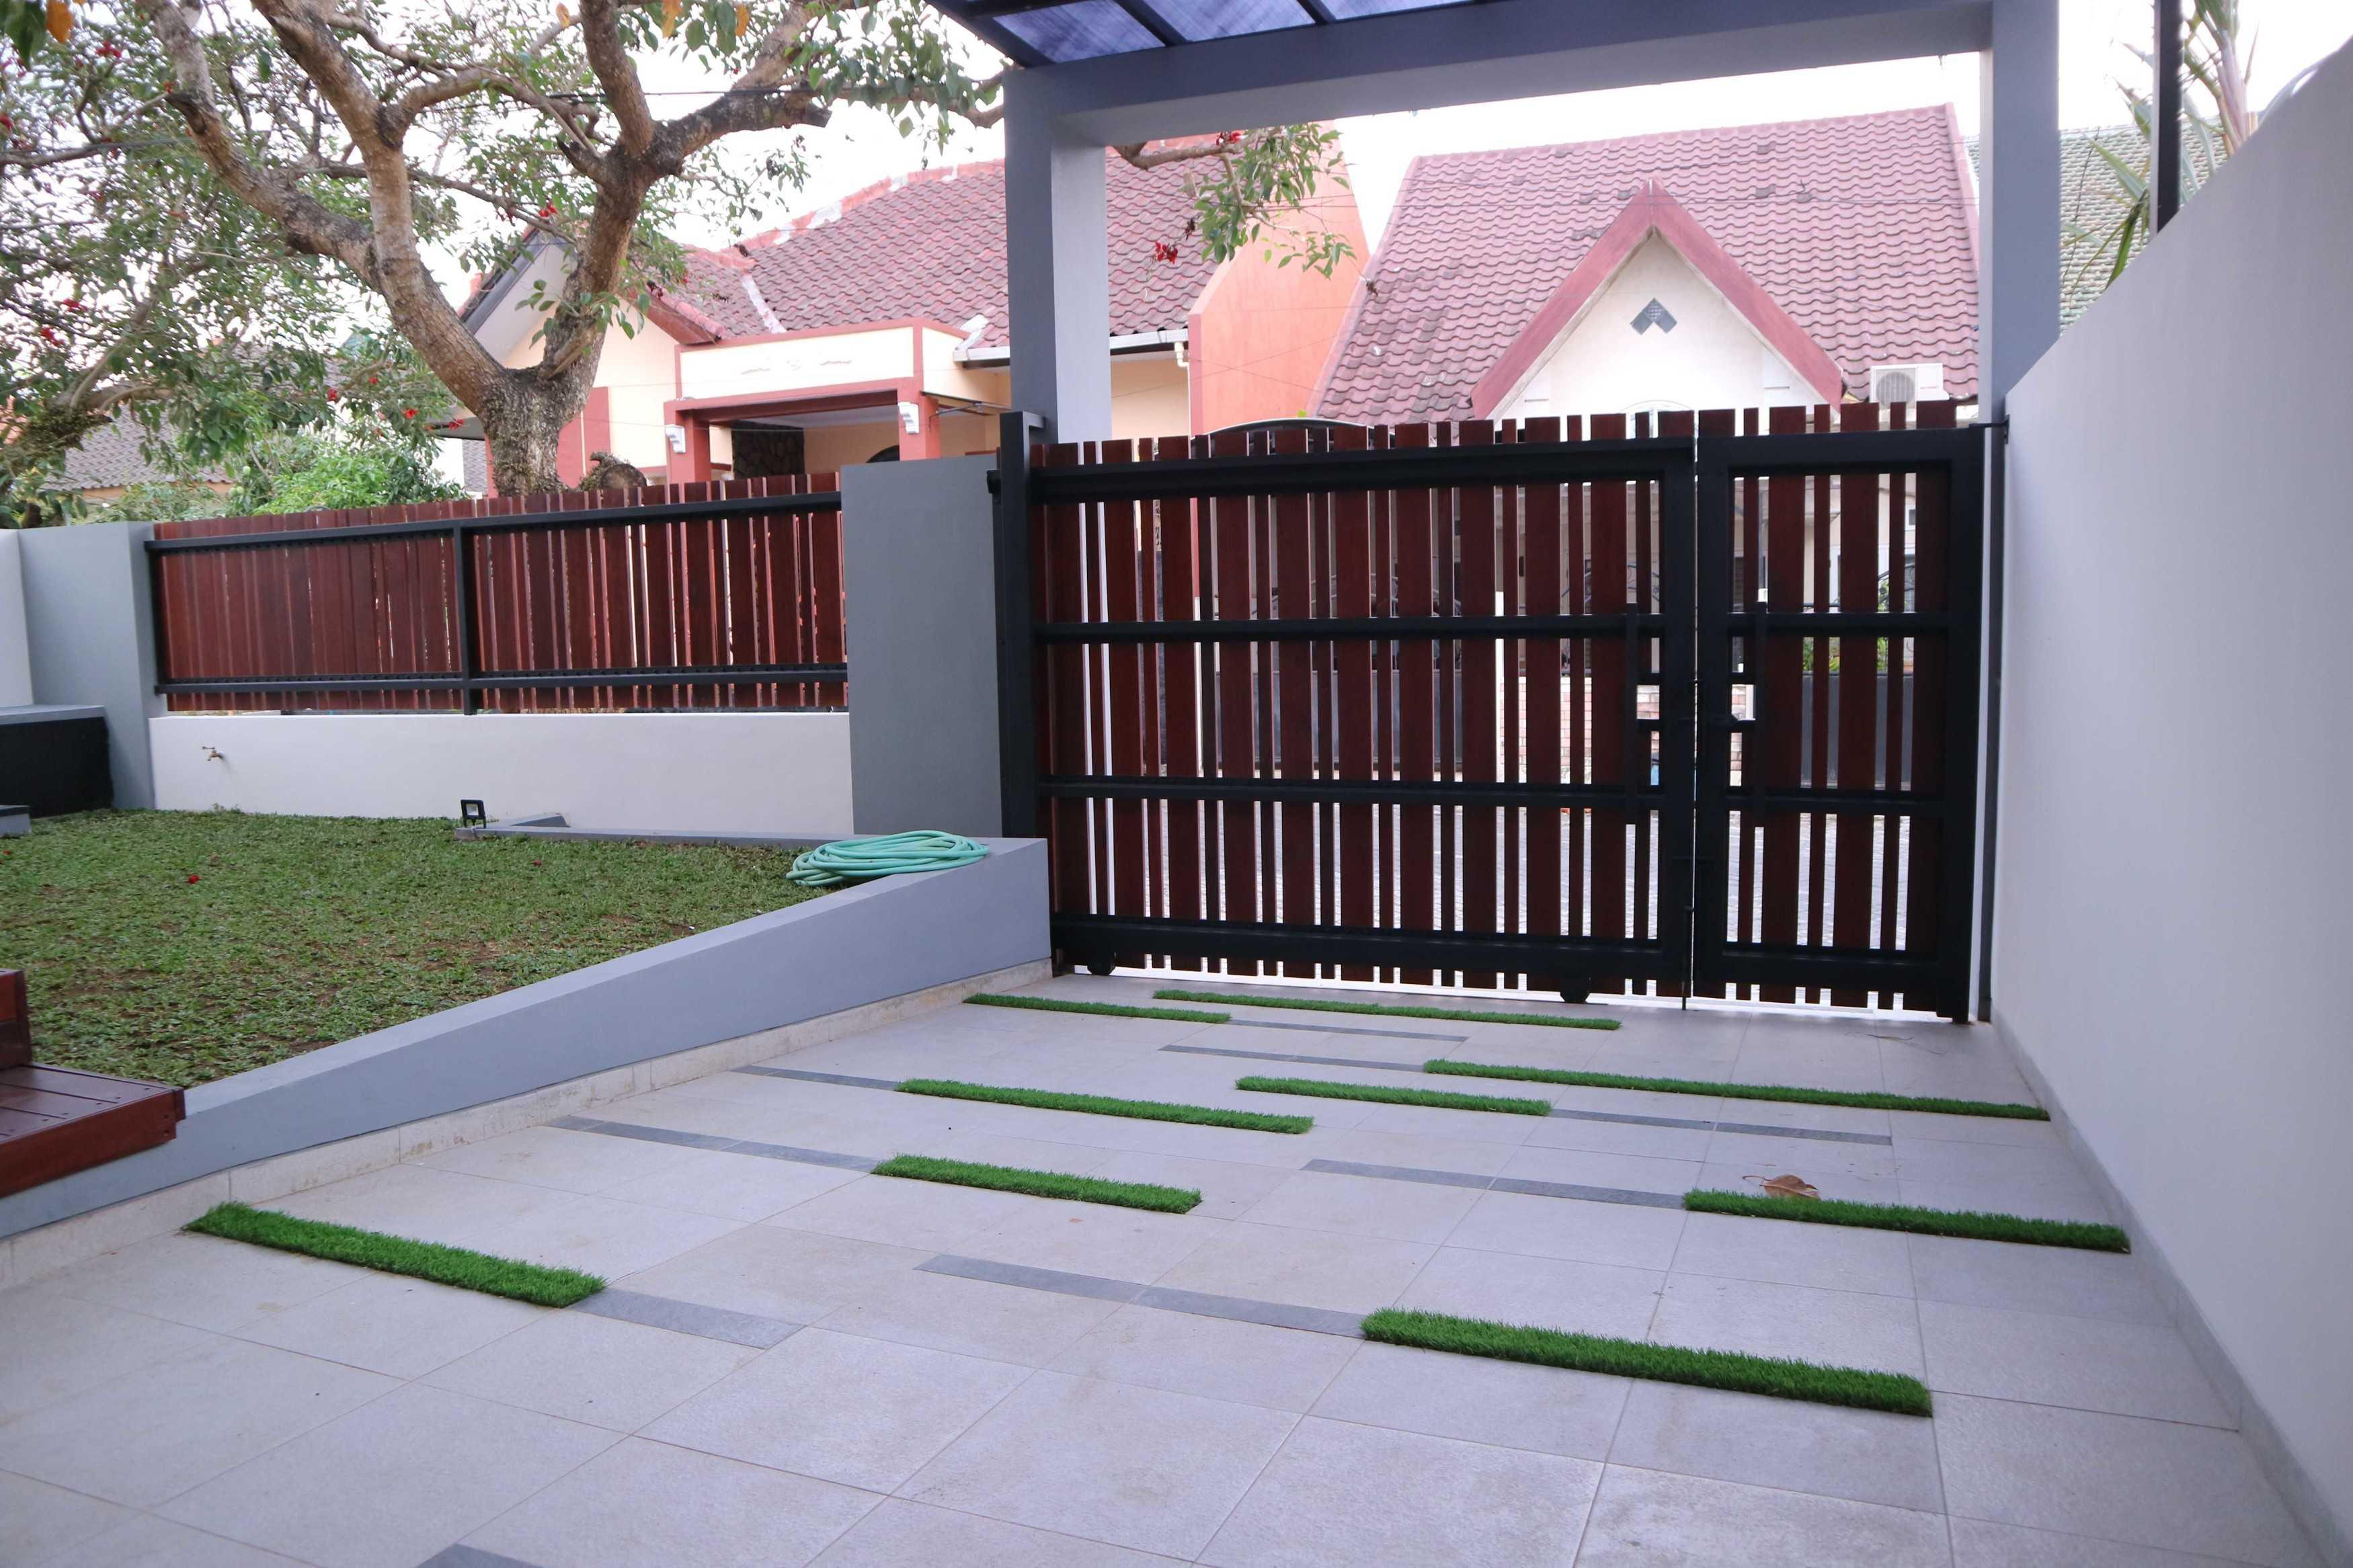 Arbiy Kreasi Rumah Pb Malang, Kota Malang, Jawa Timur, Indonesia Malang, Kota Malang, Jawa Timur, Indonesia Arbiy-Kreasi-Rumah-Pb   111821